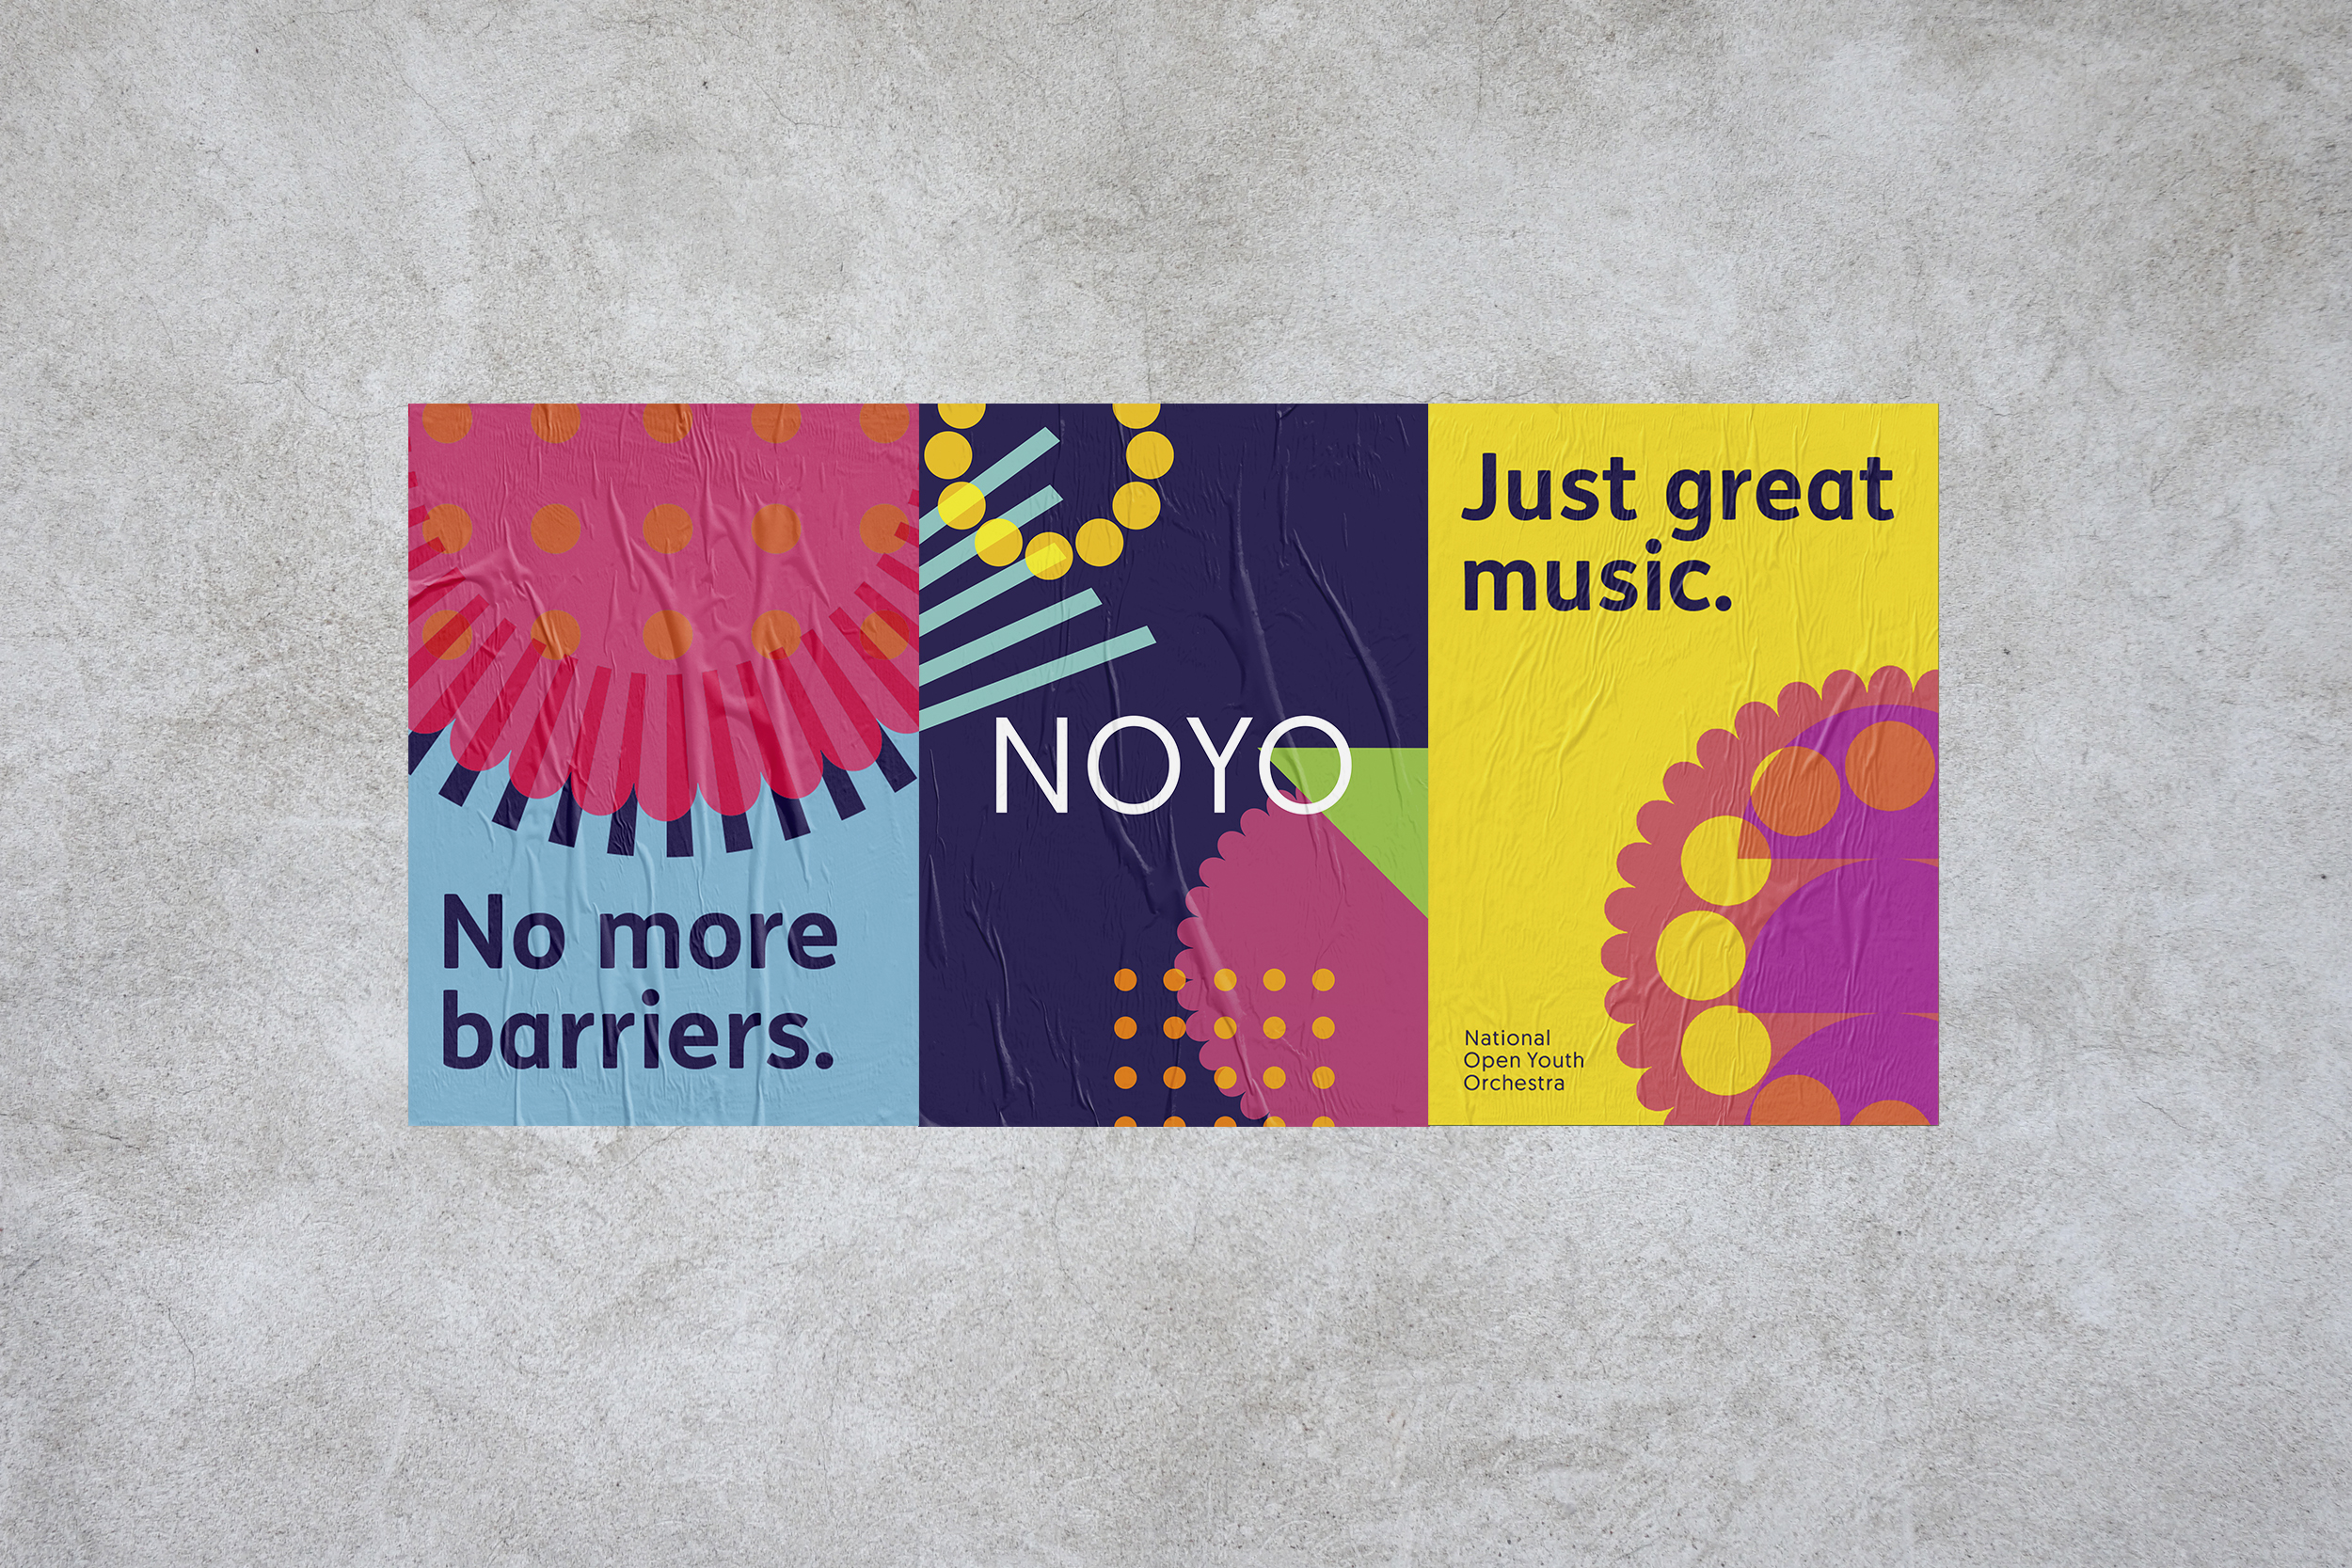 poster design for NOYO charity branding by Fiasco Design